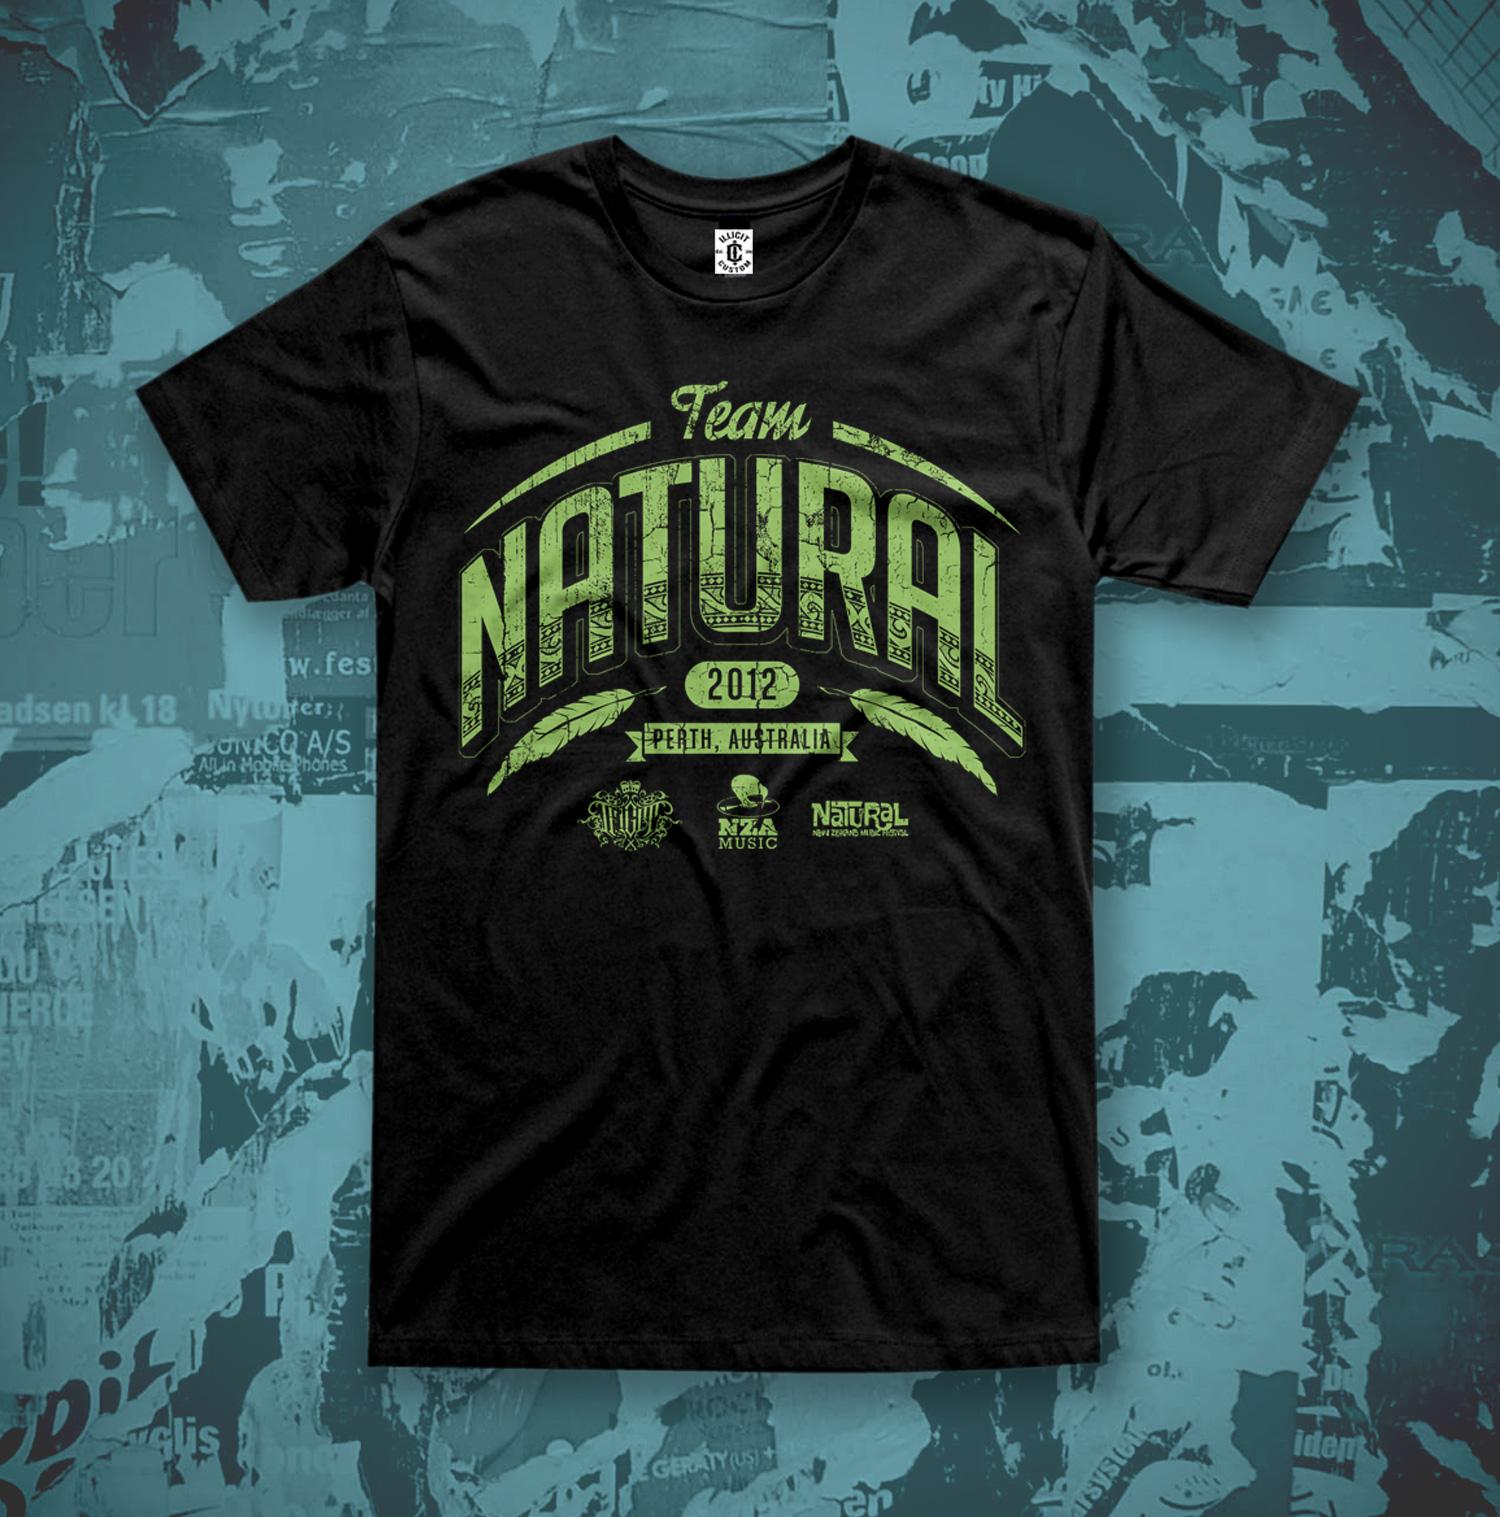 Natural T 3.jpg